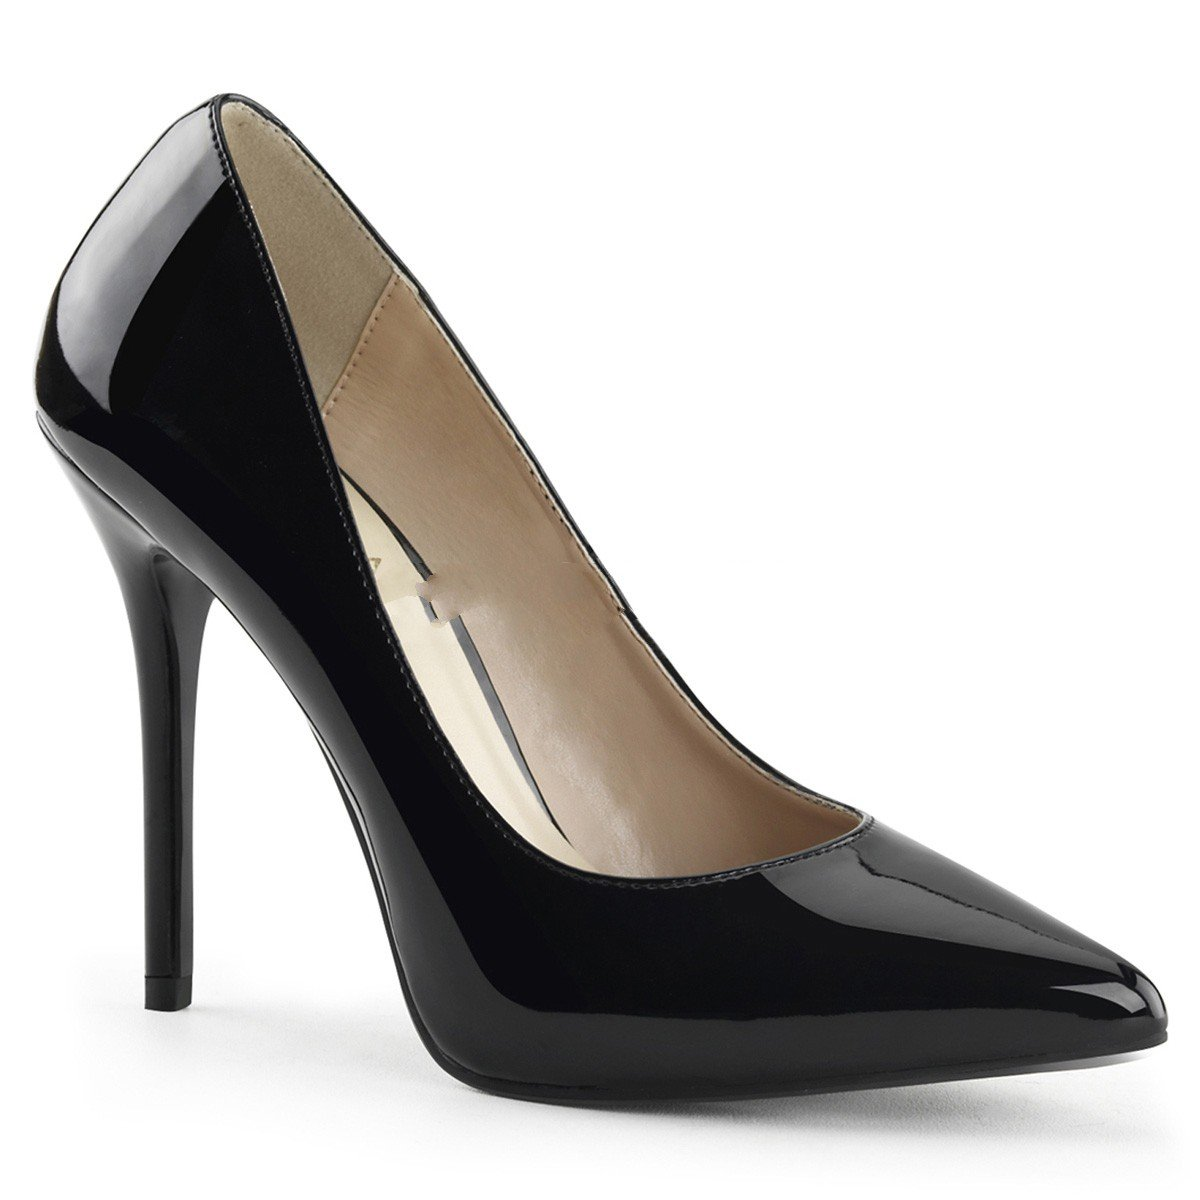 Pleaser Amuse-20 - sexy High Heels 12cm Pumps 35-48